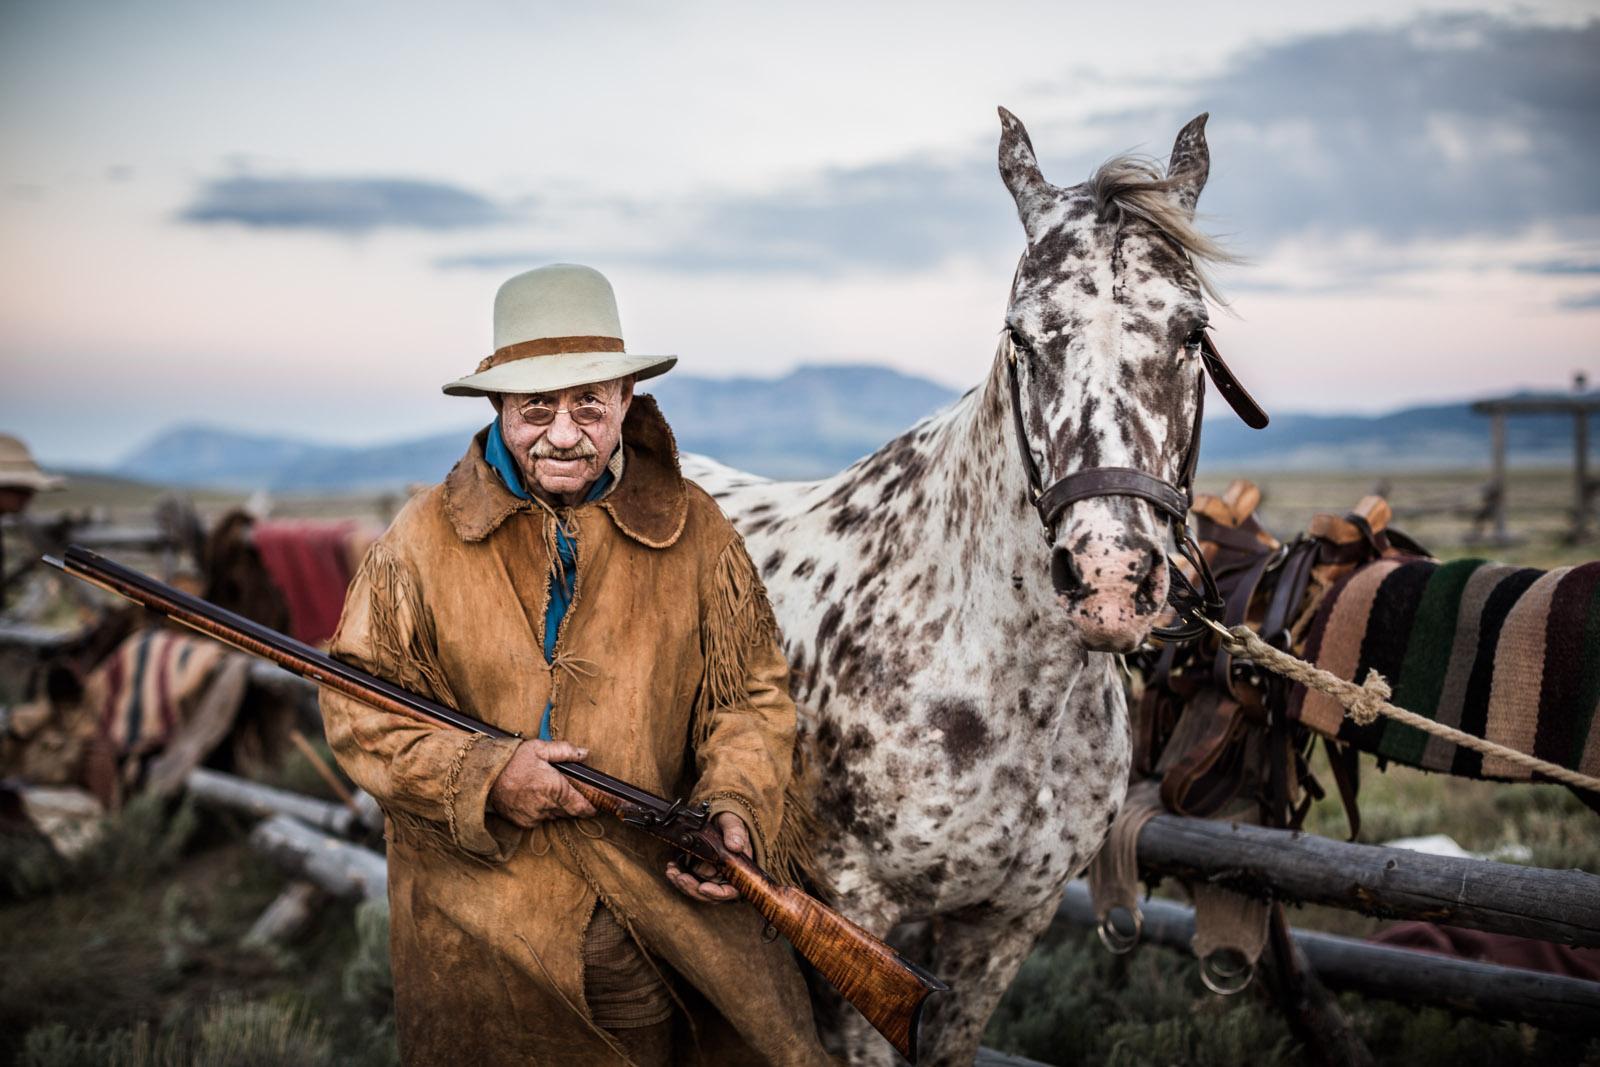 adventure adventurephotographer anhede cowboys destinationphotographer dickpieper horse jbarl jbarlranch landscapephotographer montana northamerica oklahoma pieperranch portrait portraitphotographer ranch travelphotographer usa